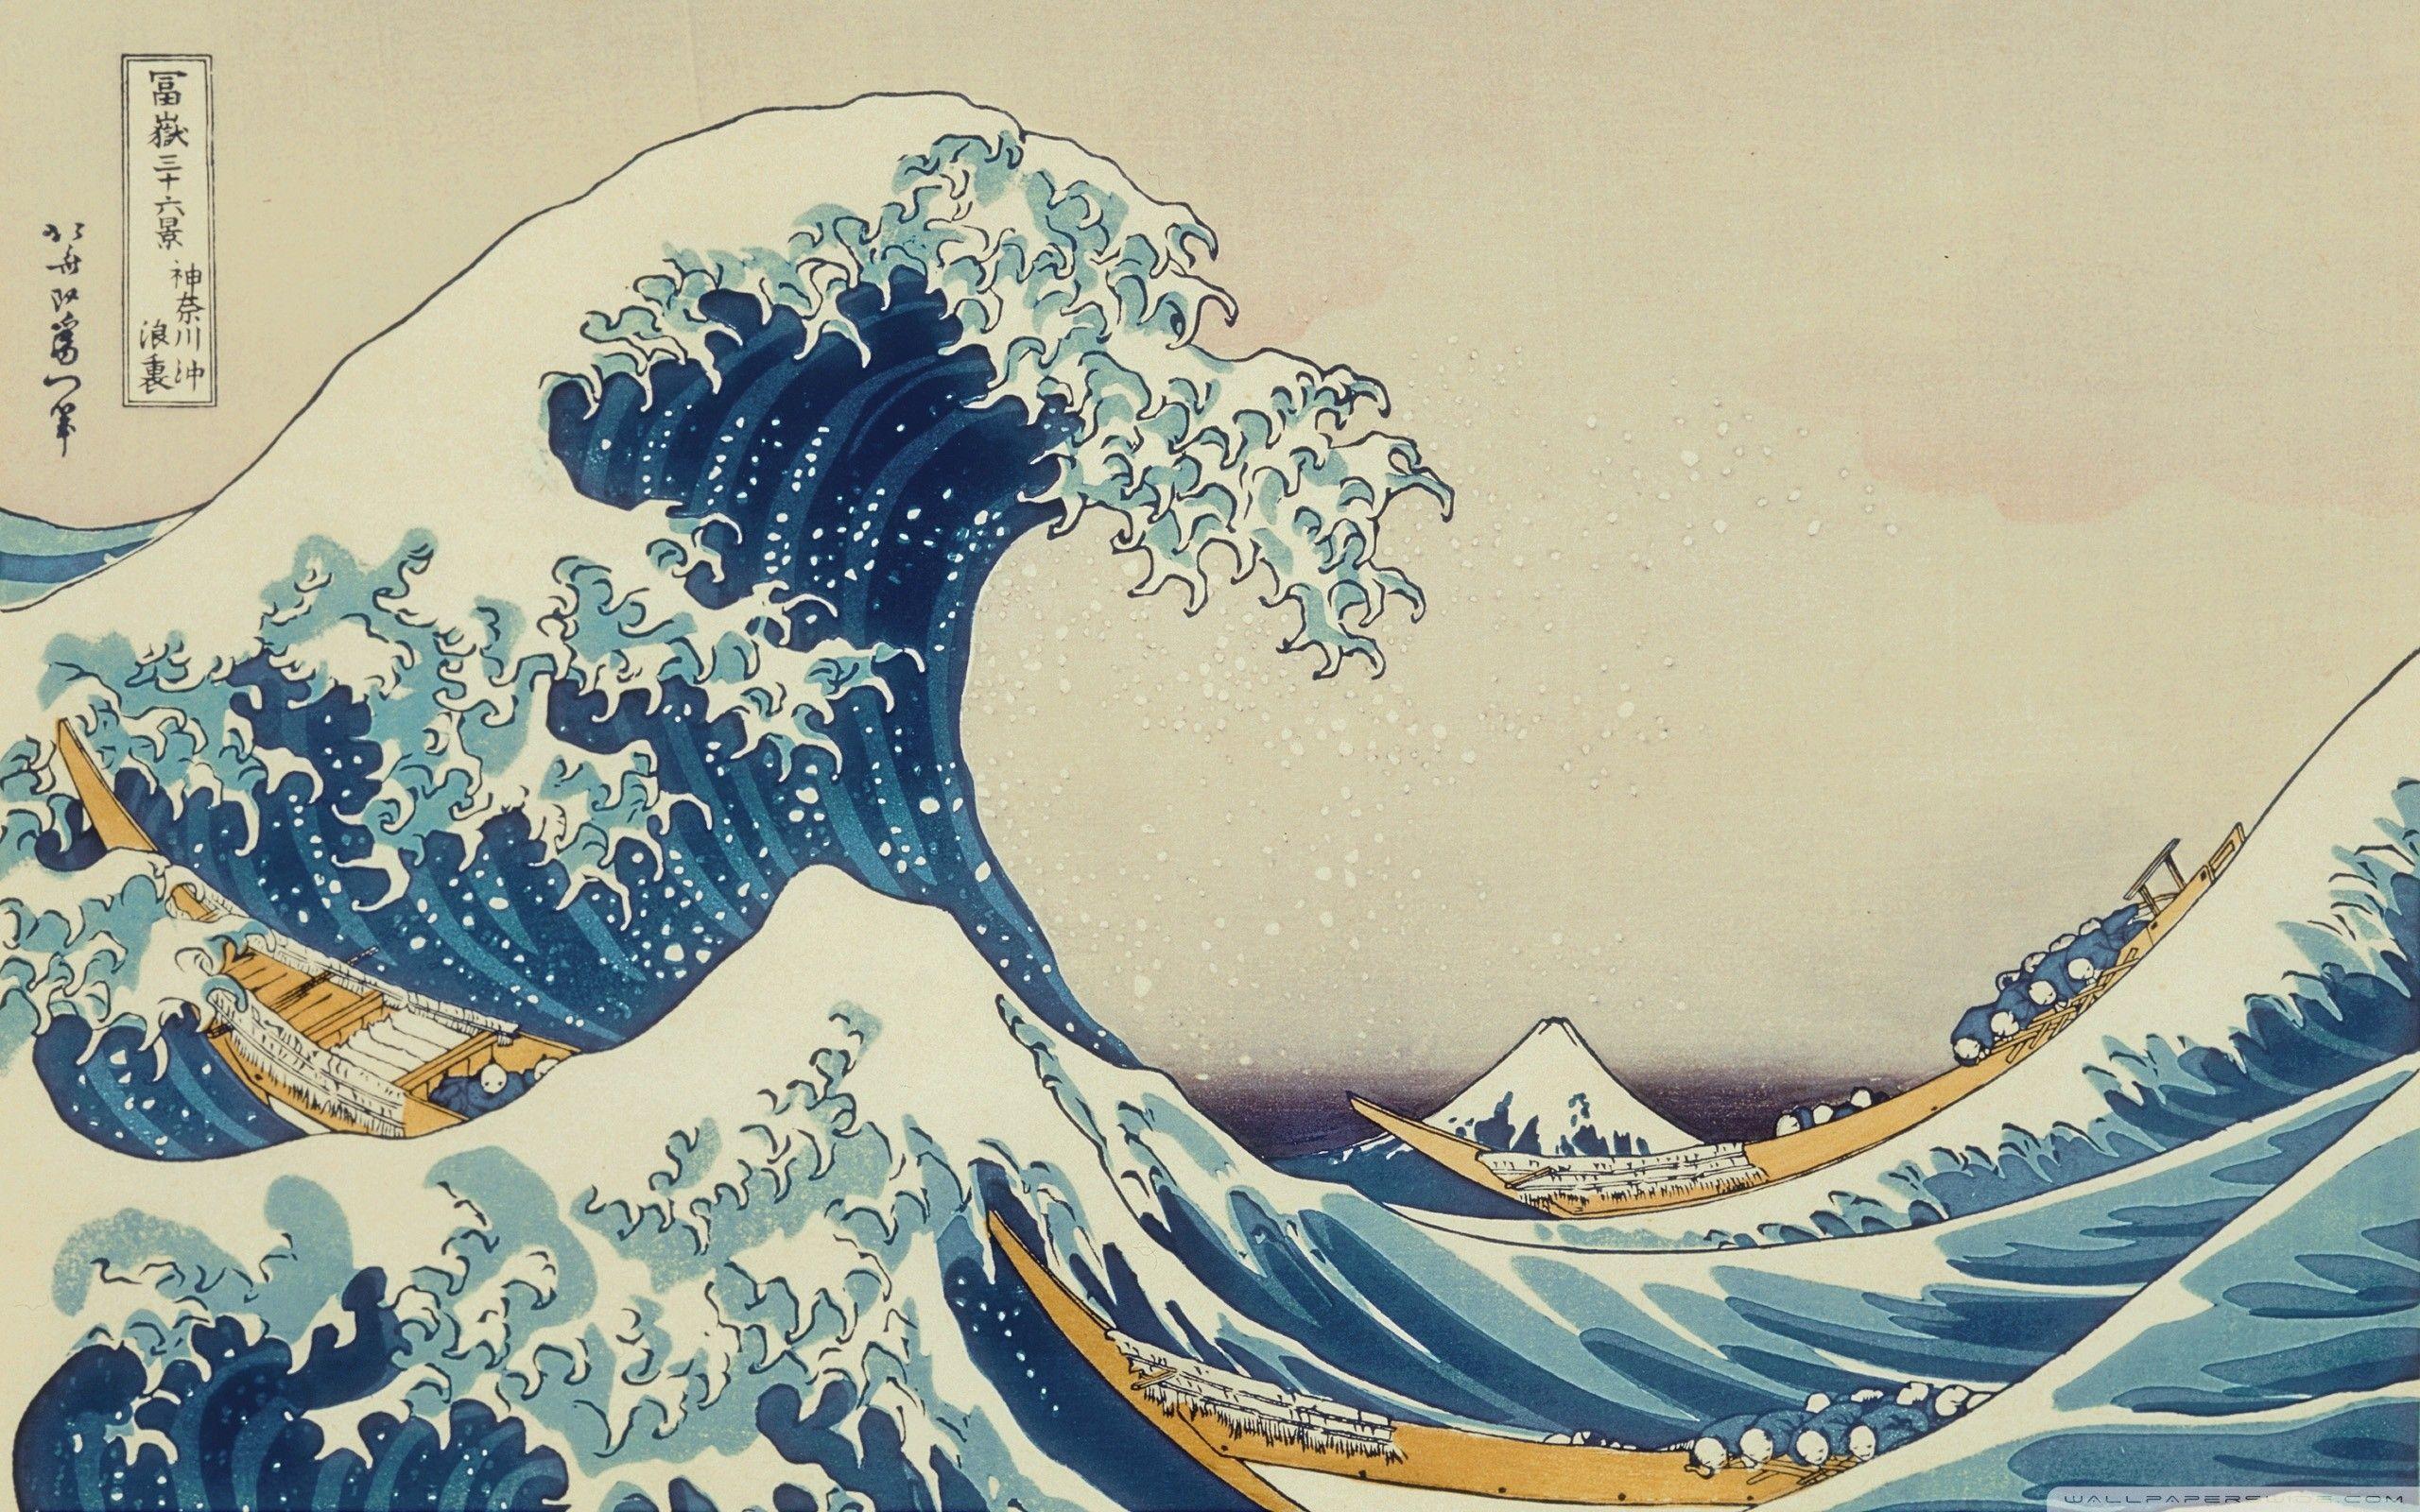 Japan Minimalist Wallpapers - Top Free Japan Minimalist ...